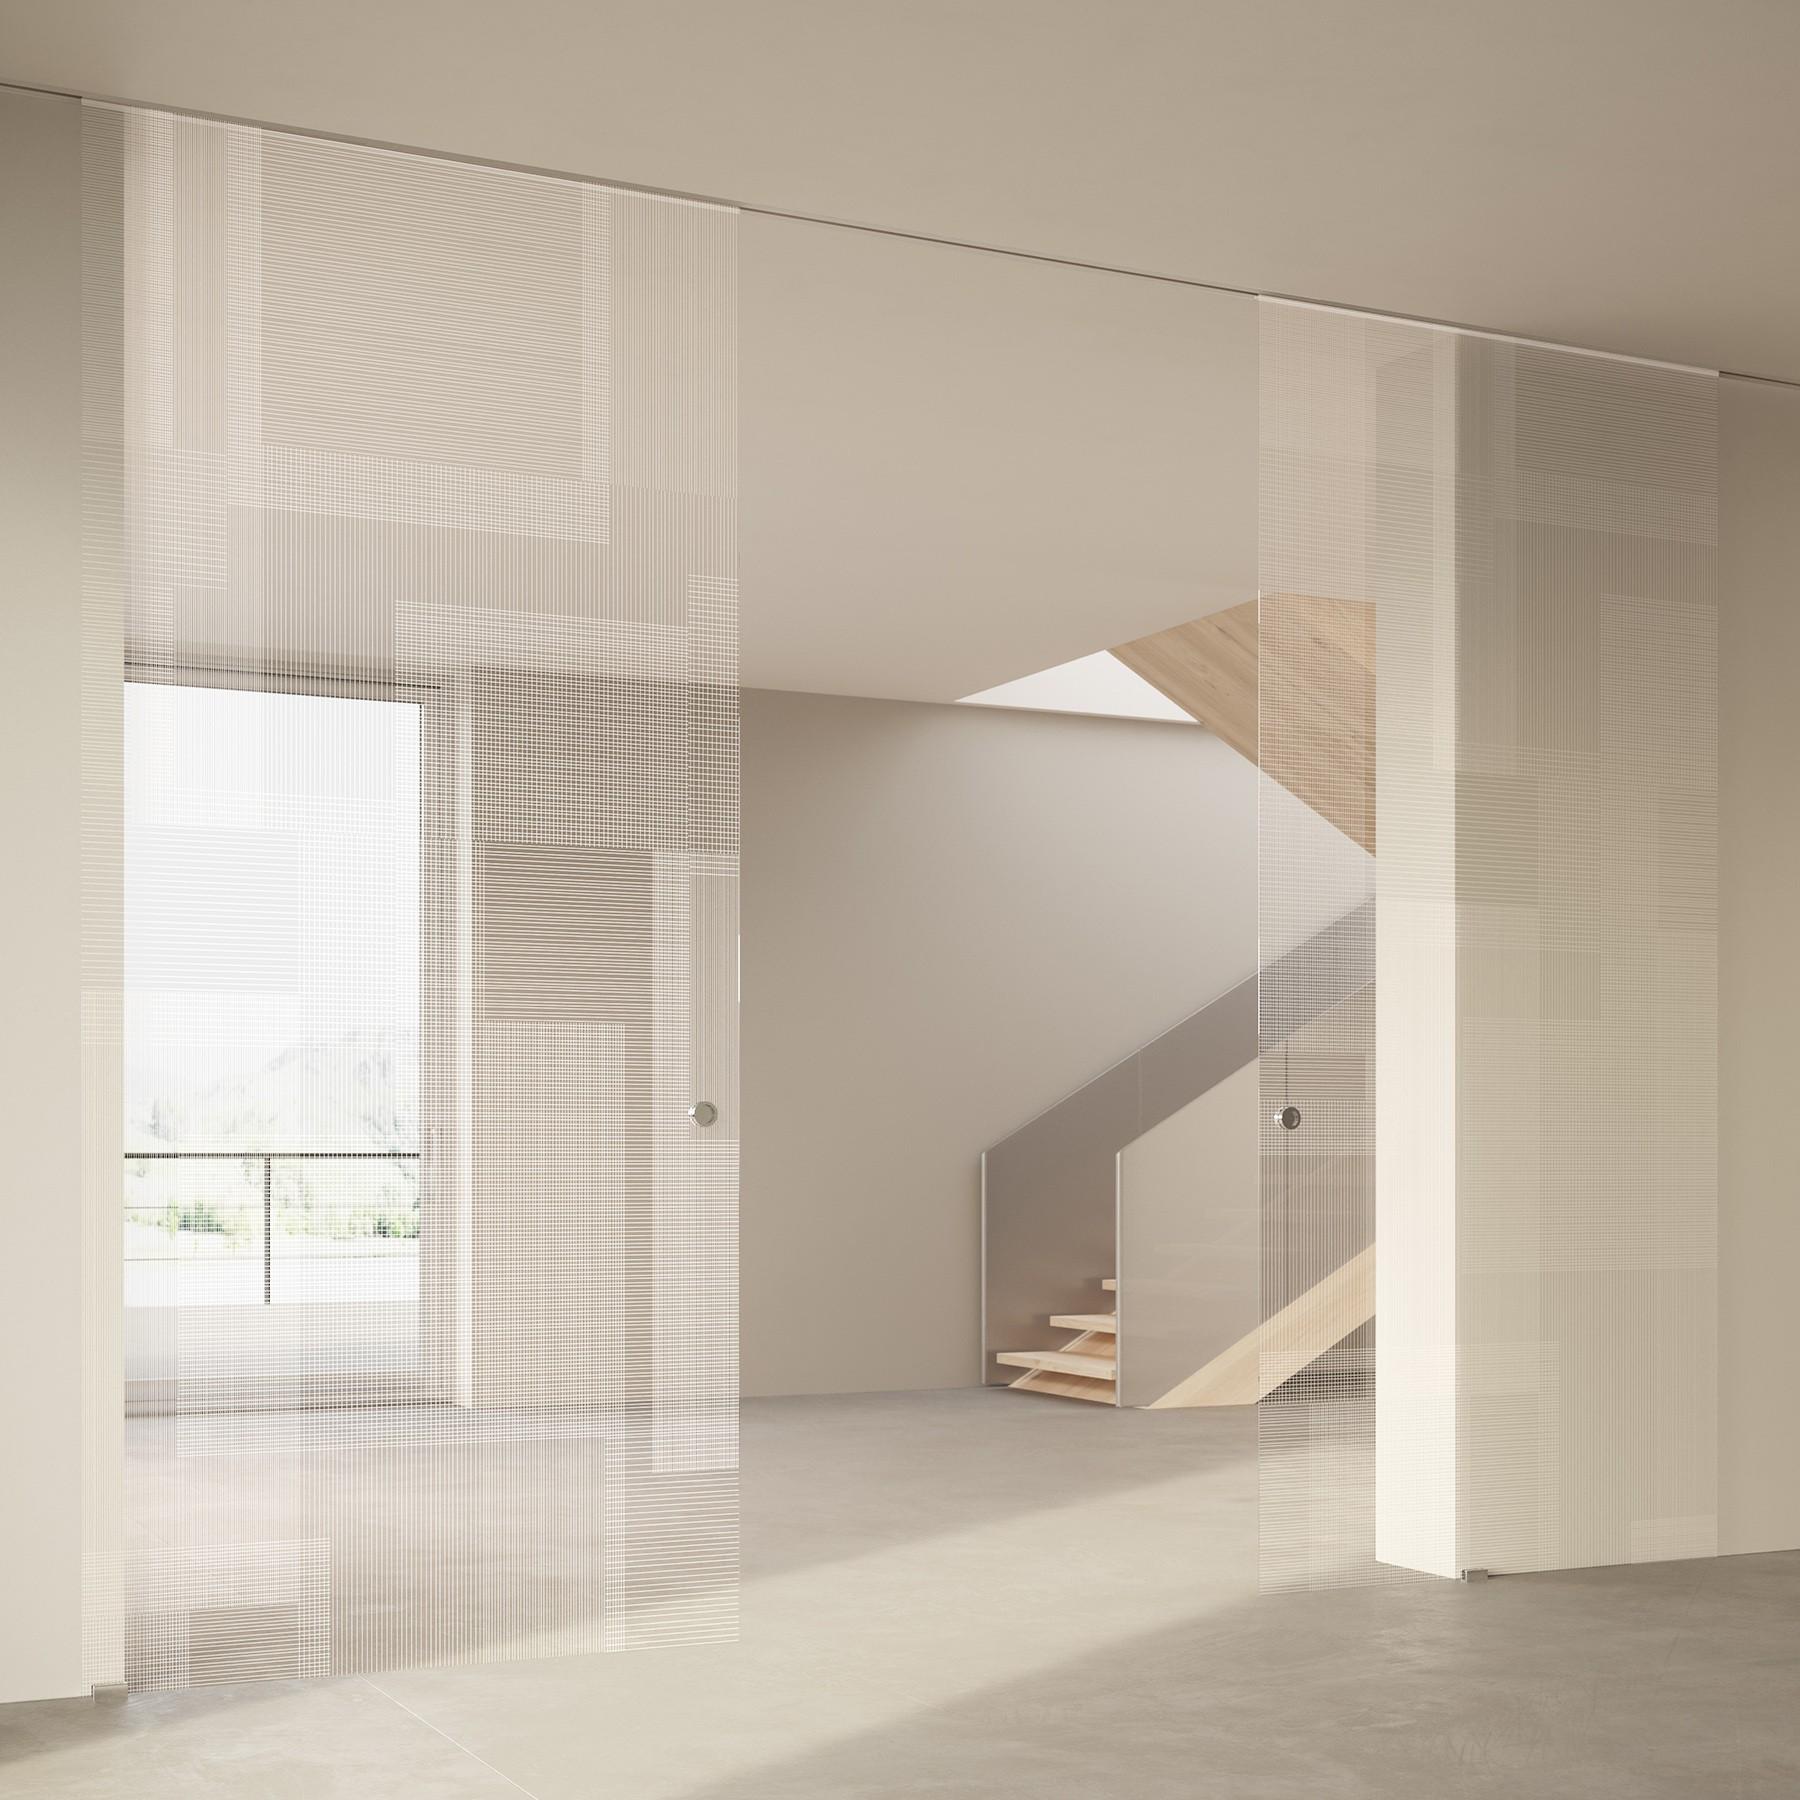 Scenario Visio Up with BIT 03 trasparente extrachiaro bianco glass